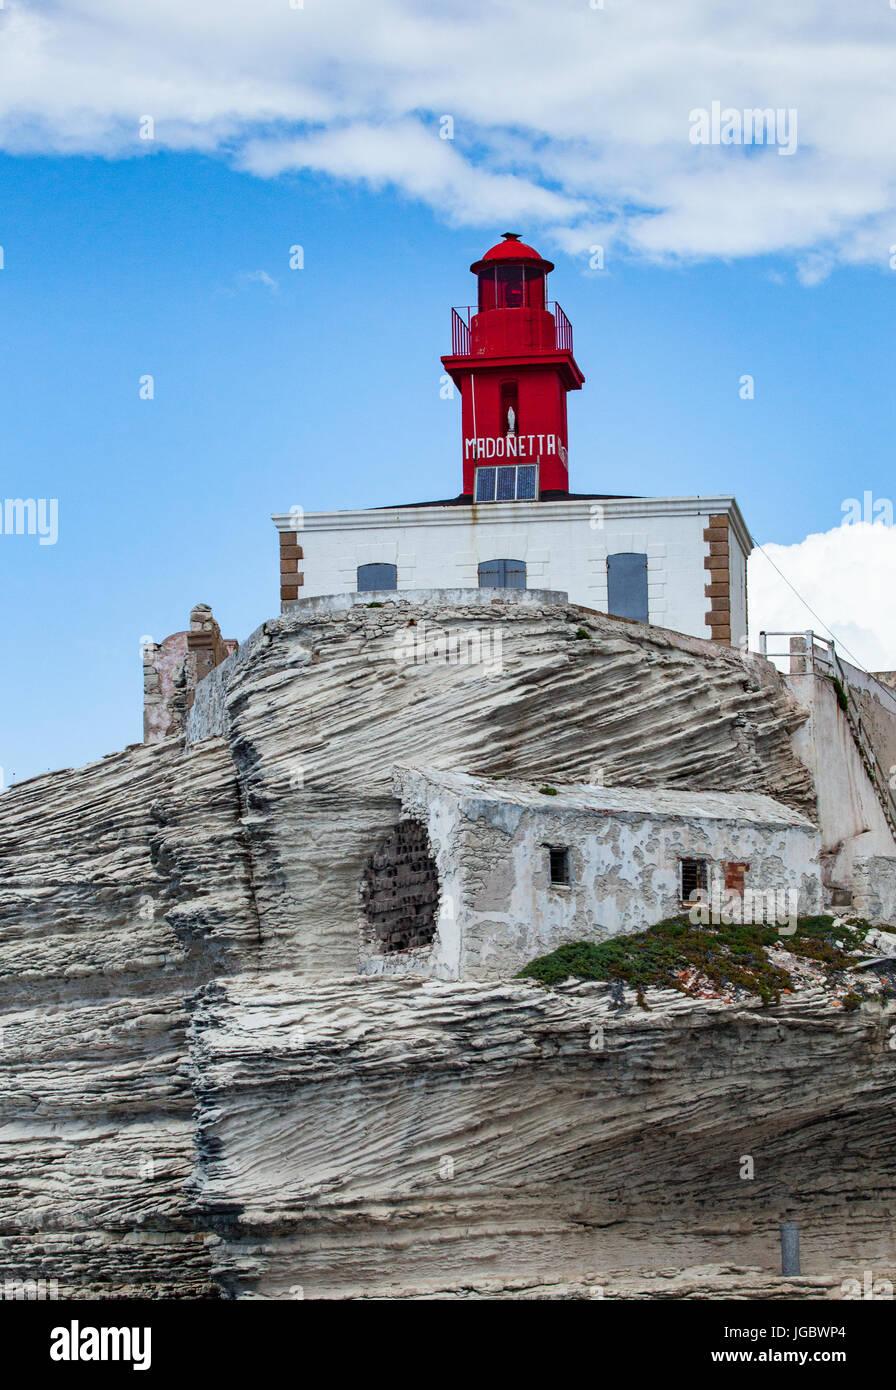 The cliffs of Bonifacio lighthouse Madonetta - Stock Image